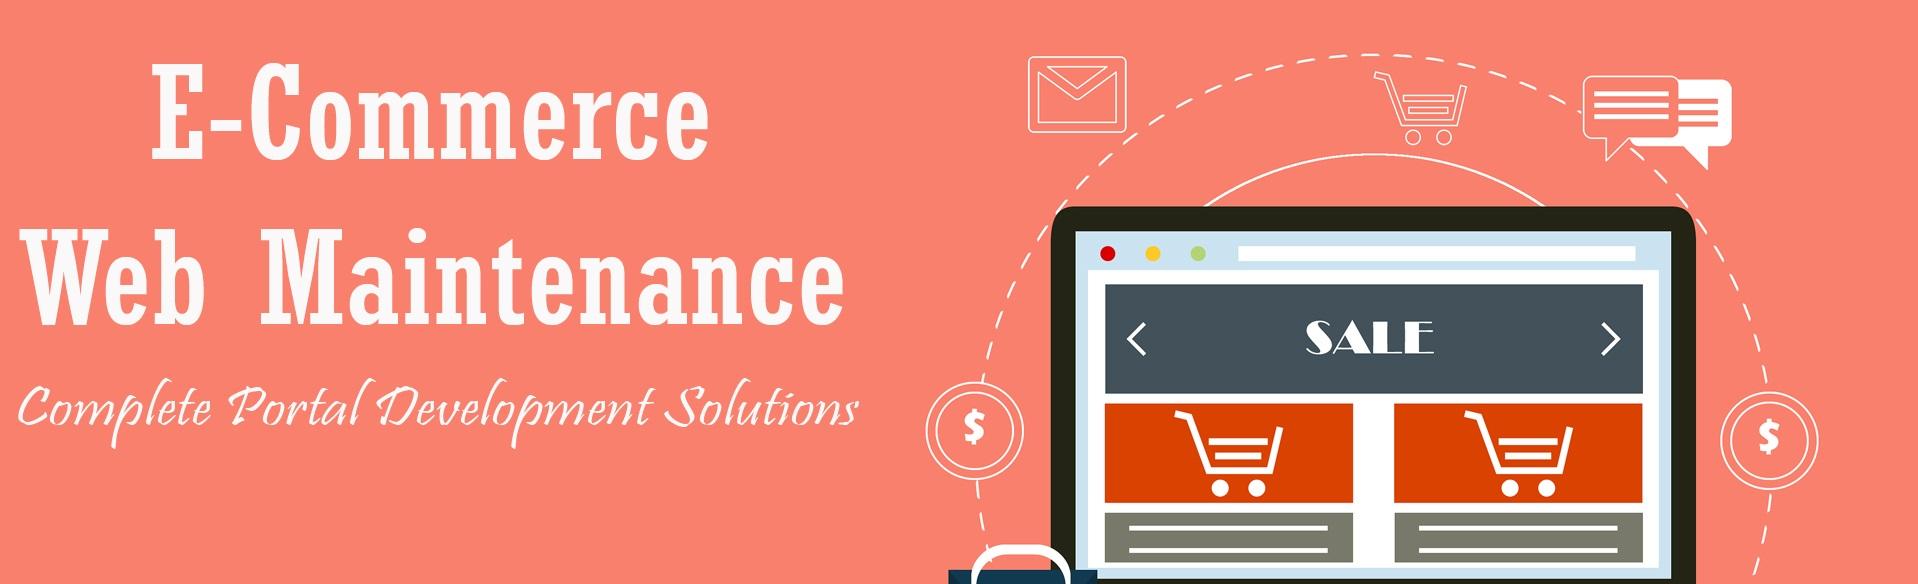 Best Ecommerce Website Maintenance Company Web Design Services Agency Mint Media